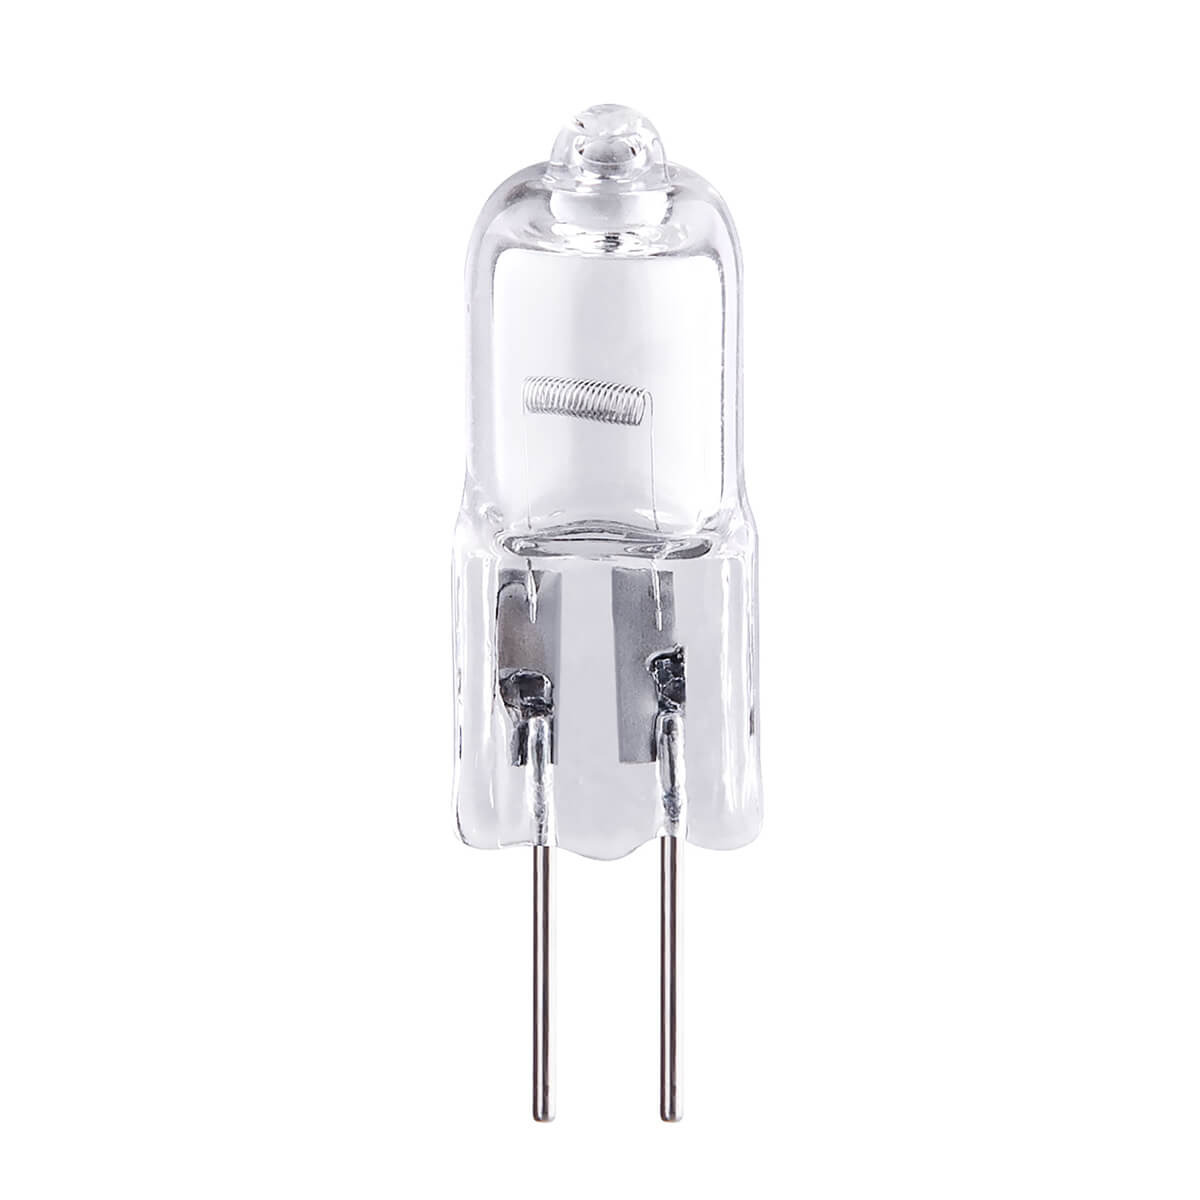 Лампочка Elektrostandard 4690389013614 Гало